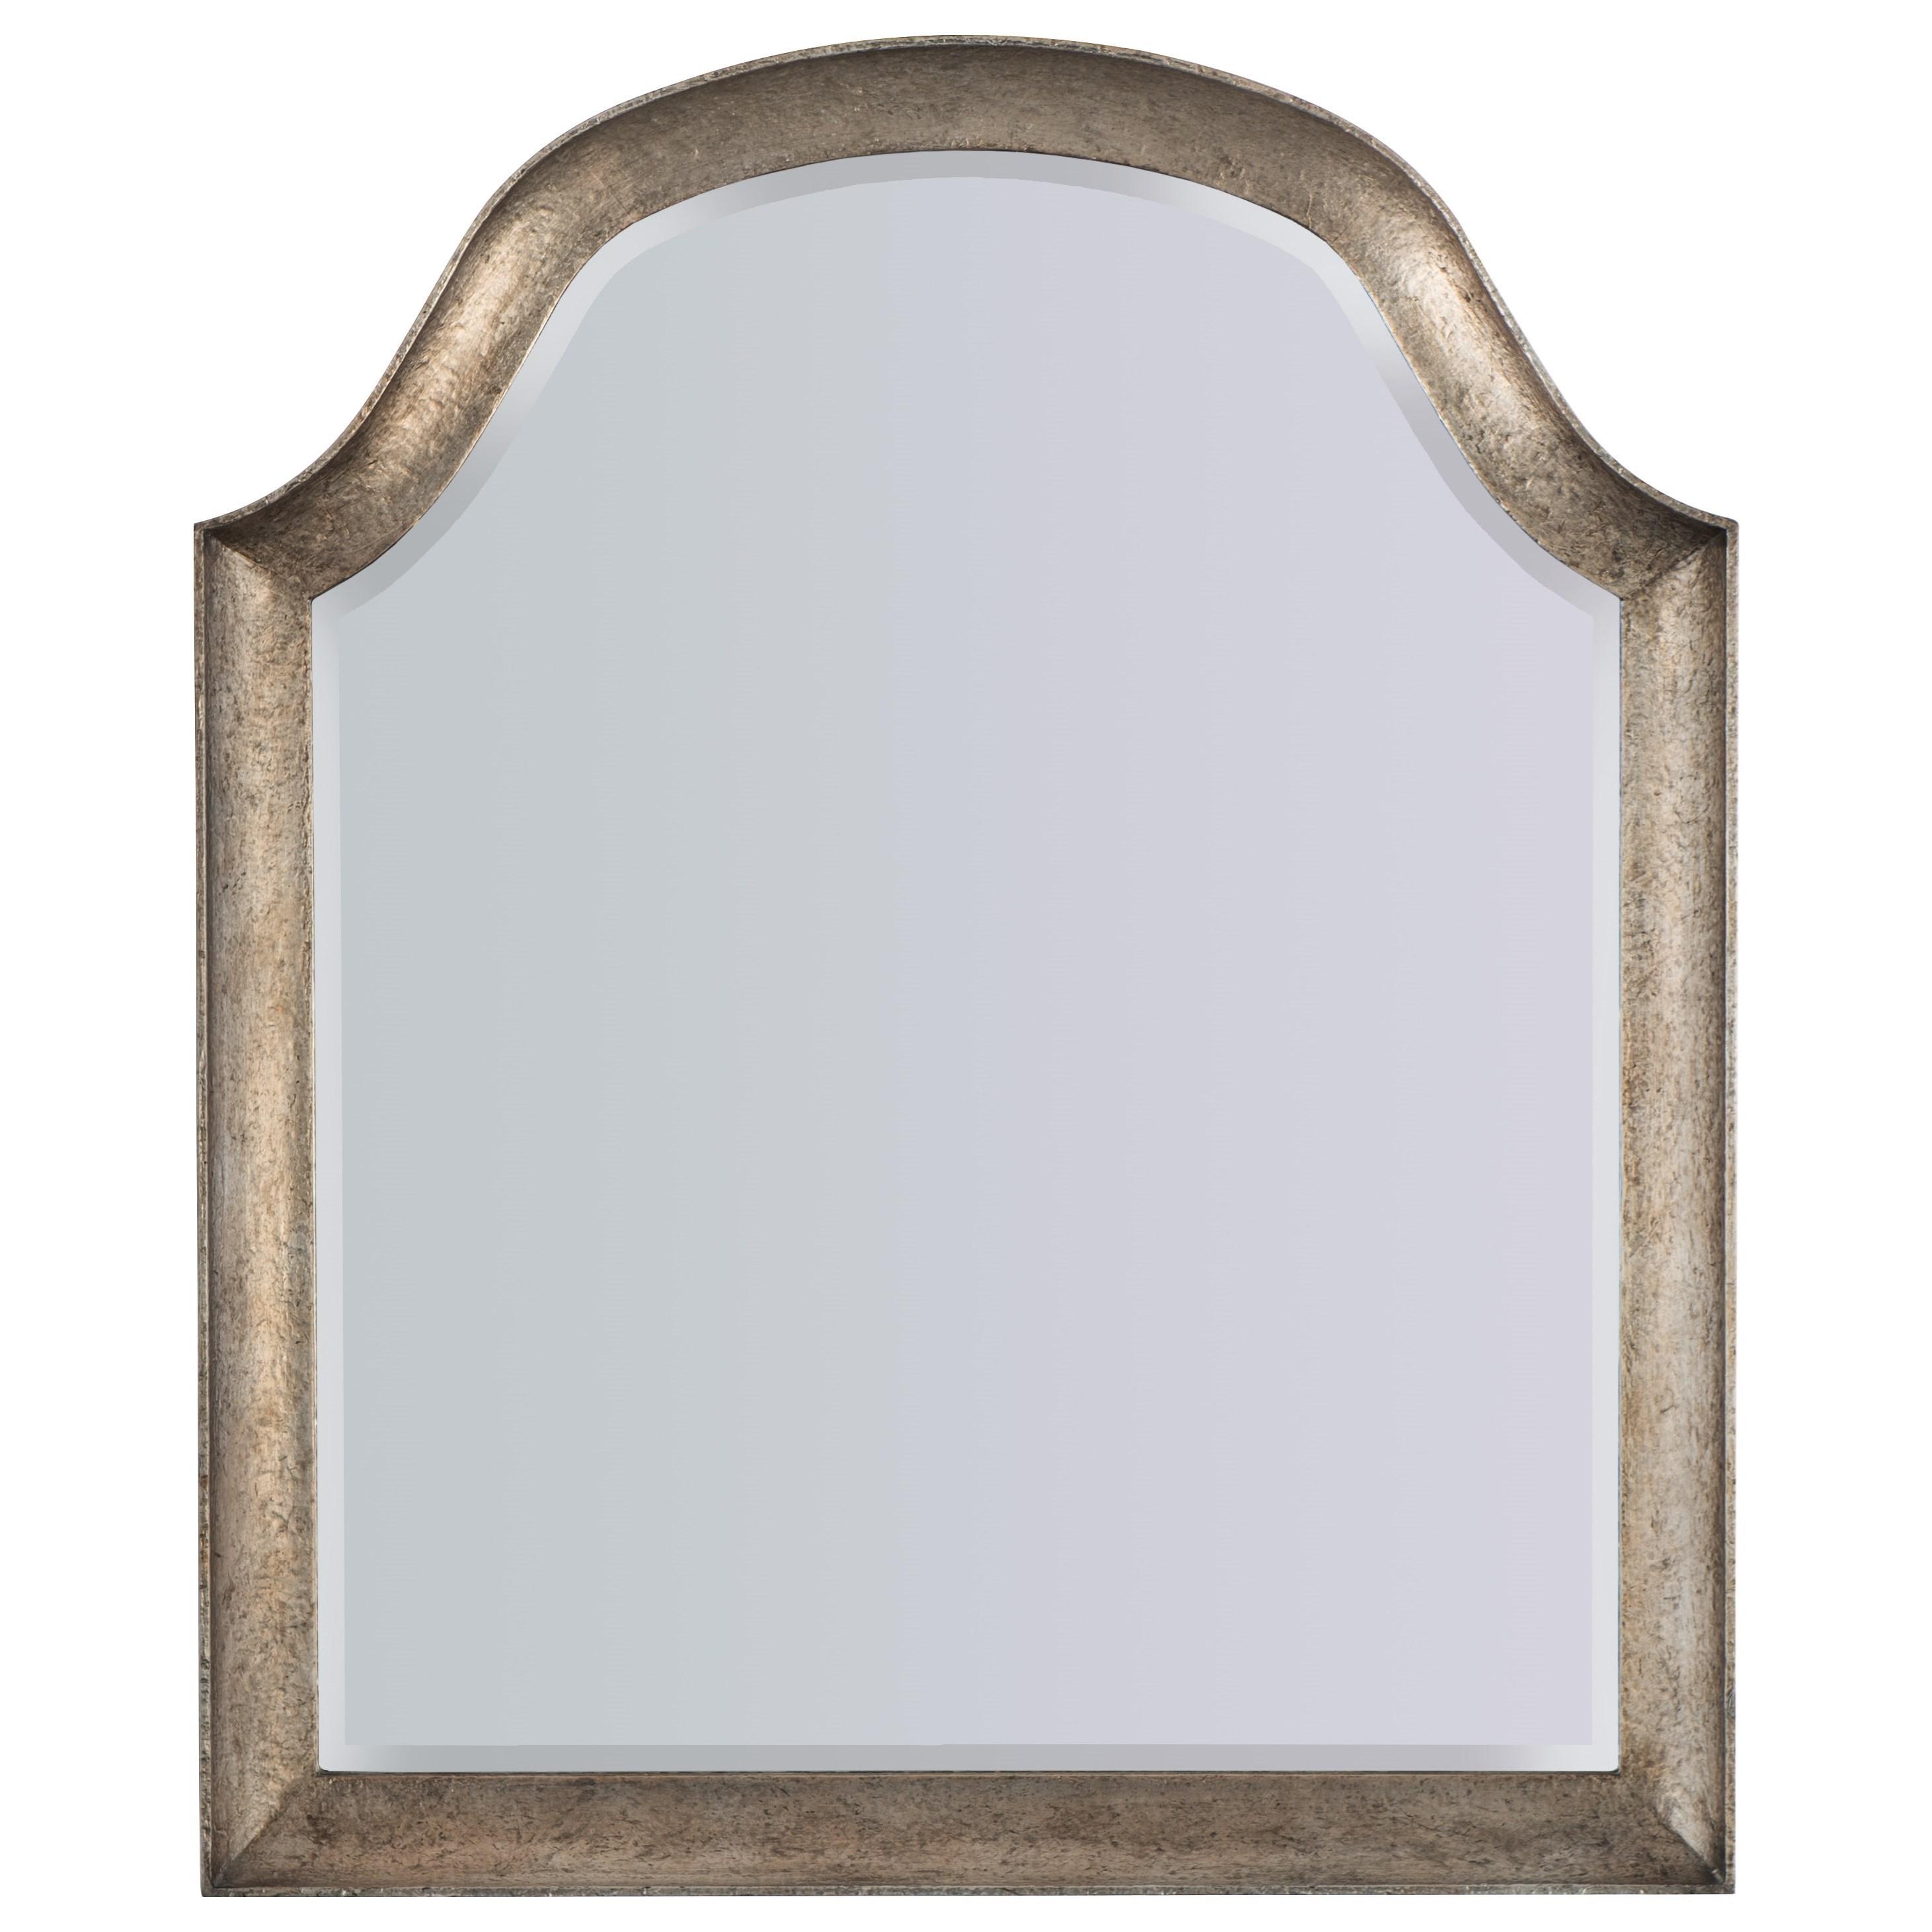 Alfresco Metallo Mirror by Hooker Furniture at Baer's Furniture